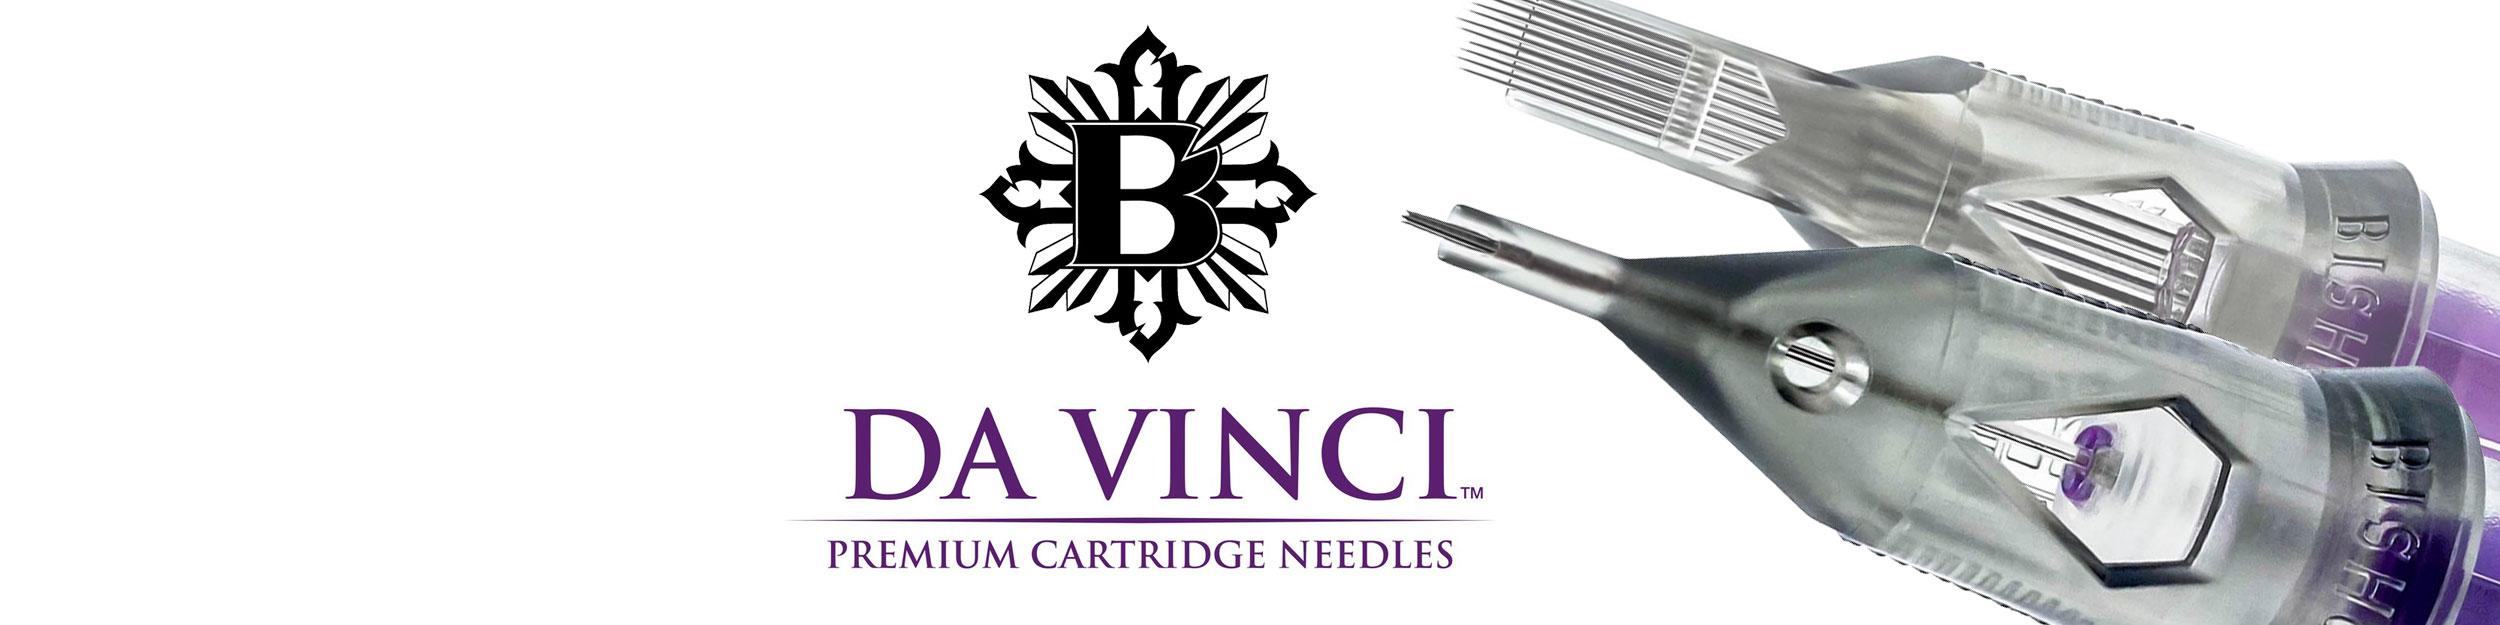 BISHOP DA VINCI Cartridges